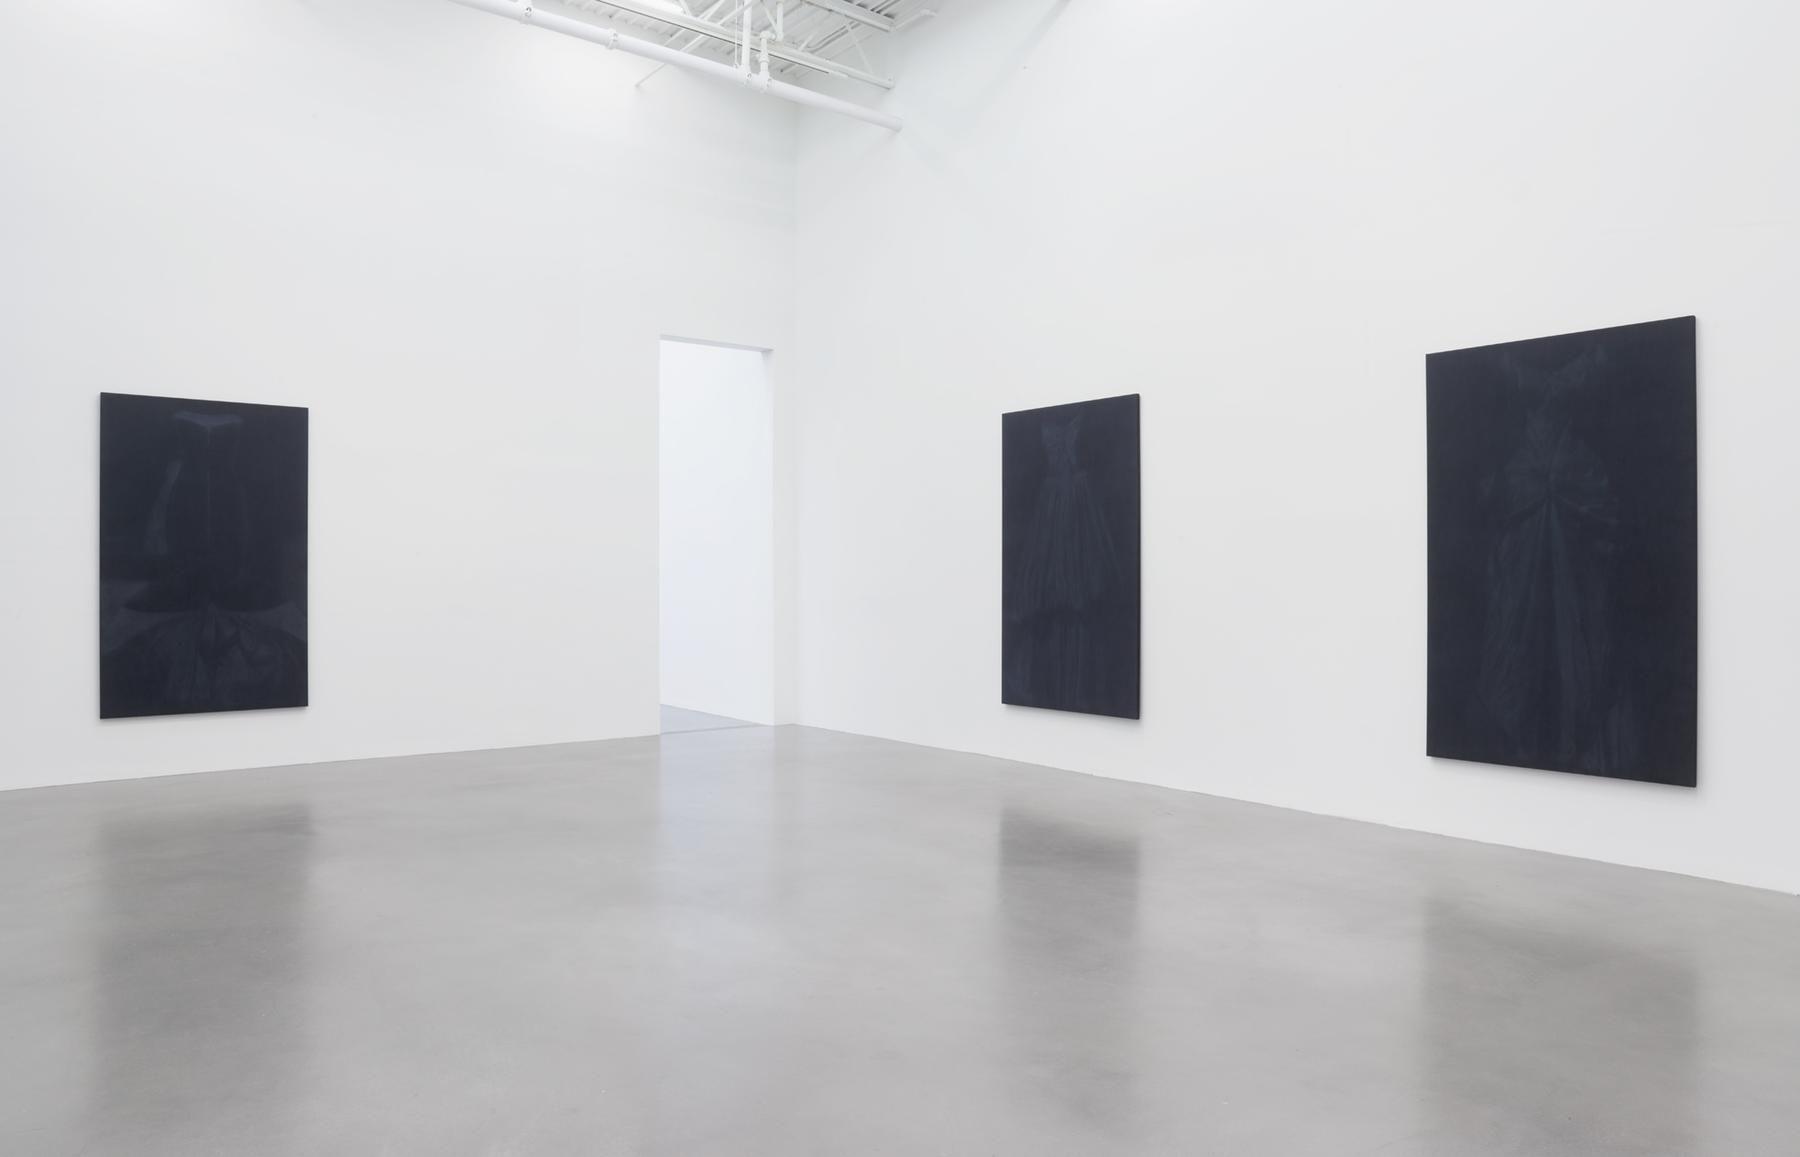 Troy Brauntuch Installation view 4